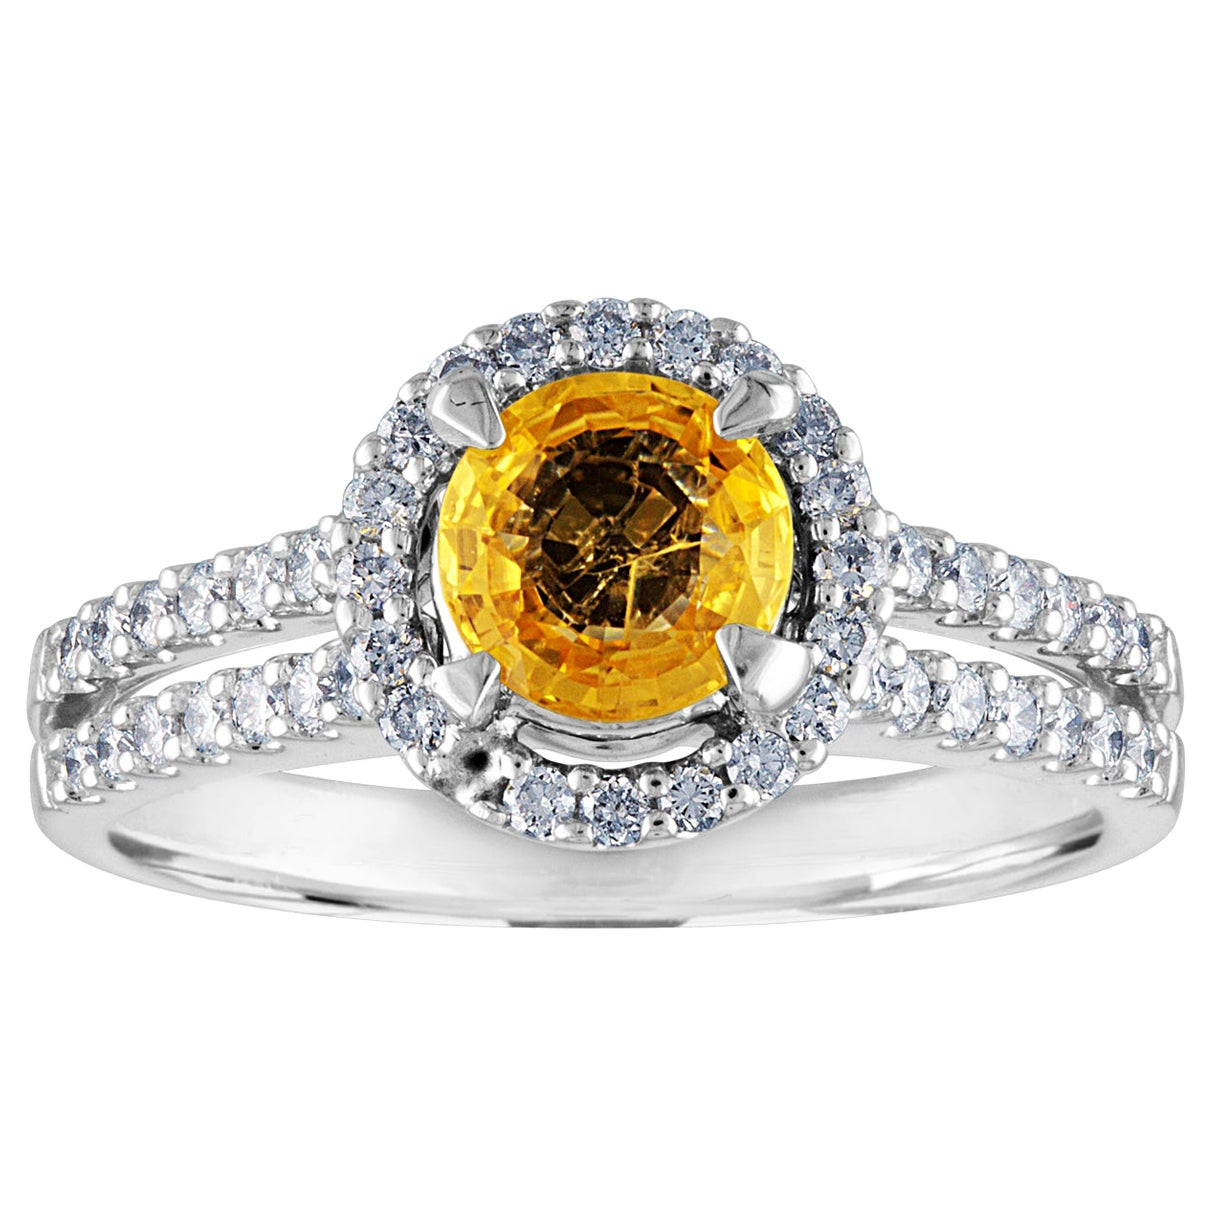 AGL Certified 0.84 Carat Round Yellow Sapphire Diamond Gold Ring